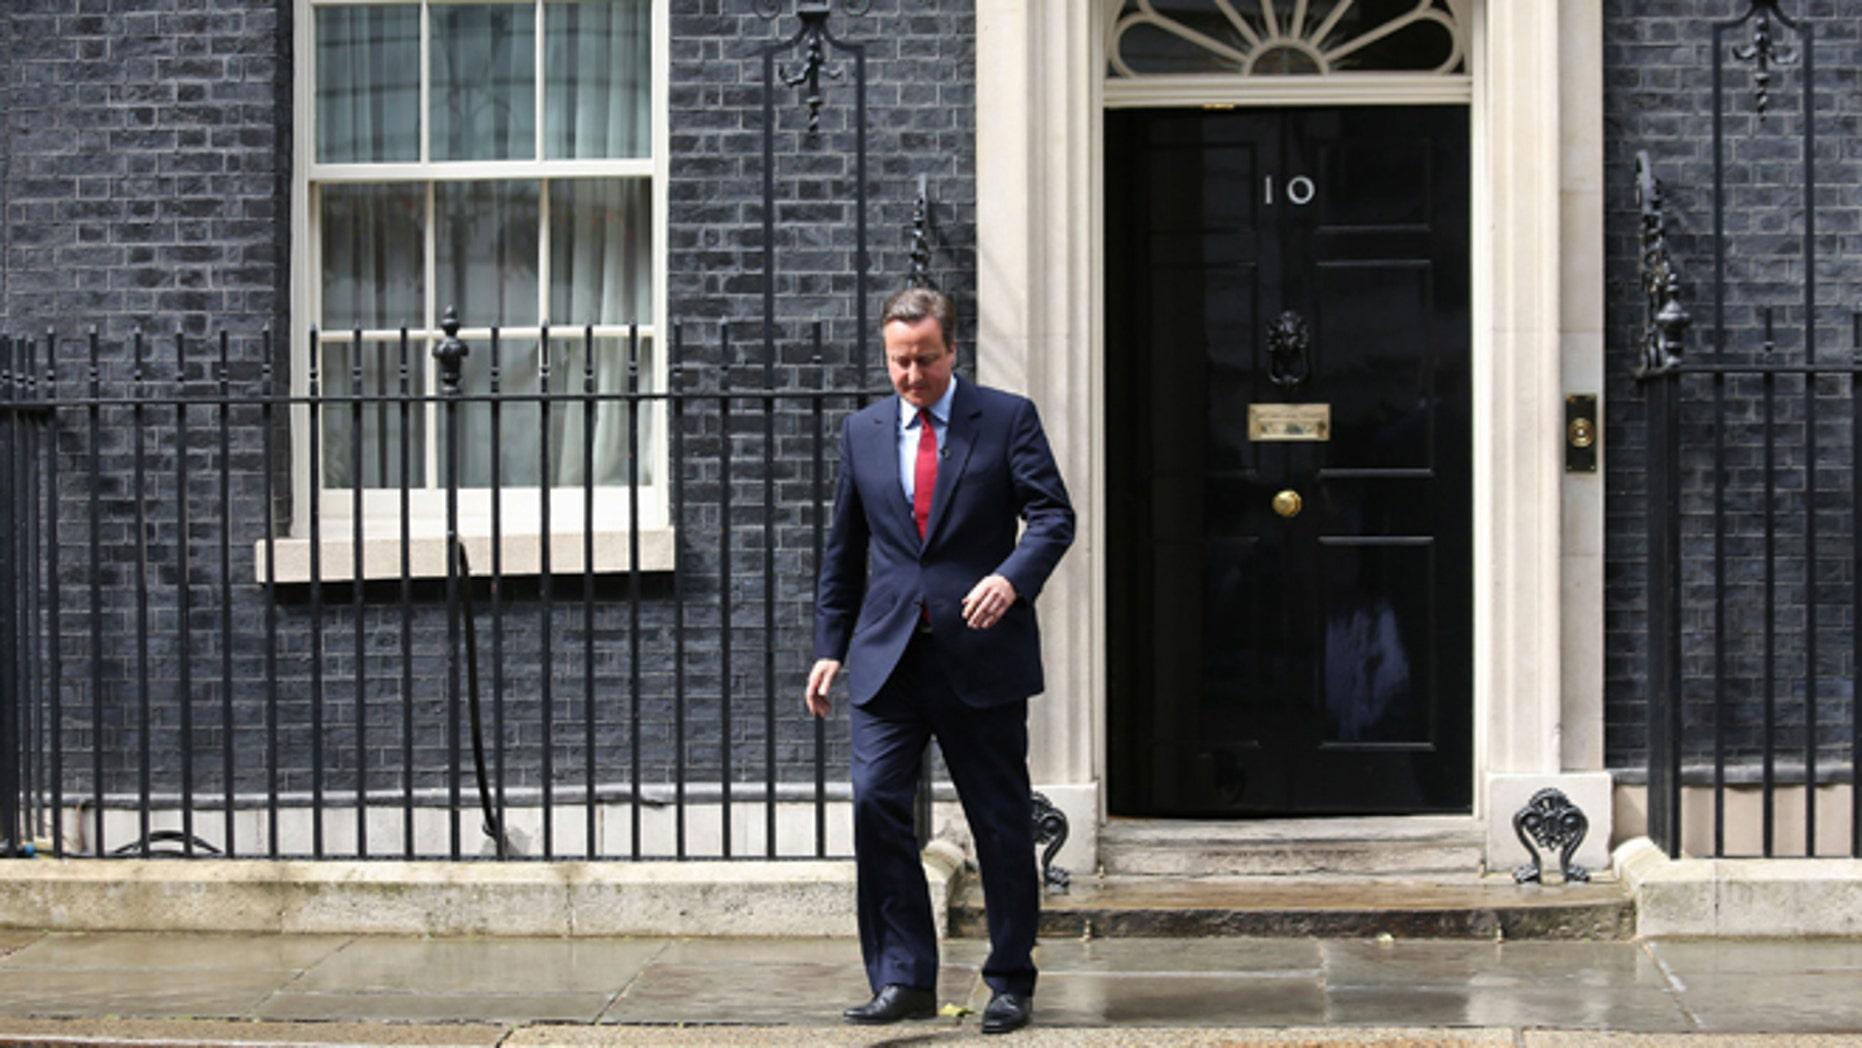 July 11: Britain's PM David Cameron walks outside No. 10 Downing Street.